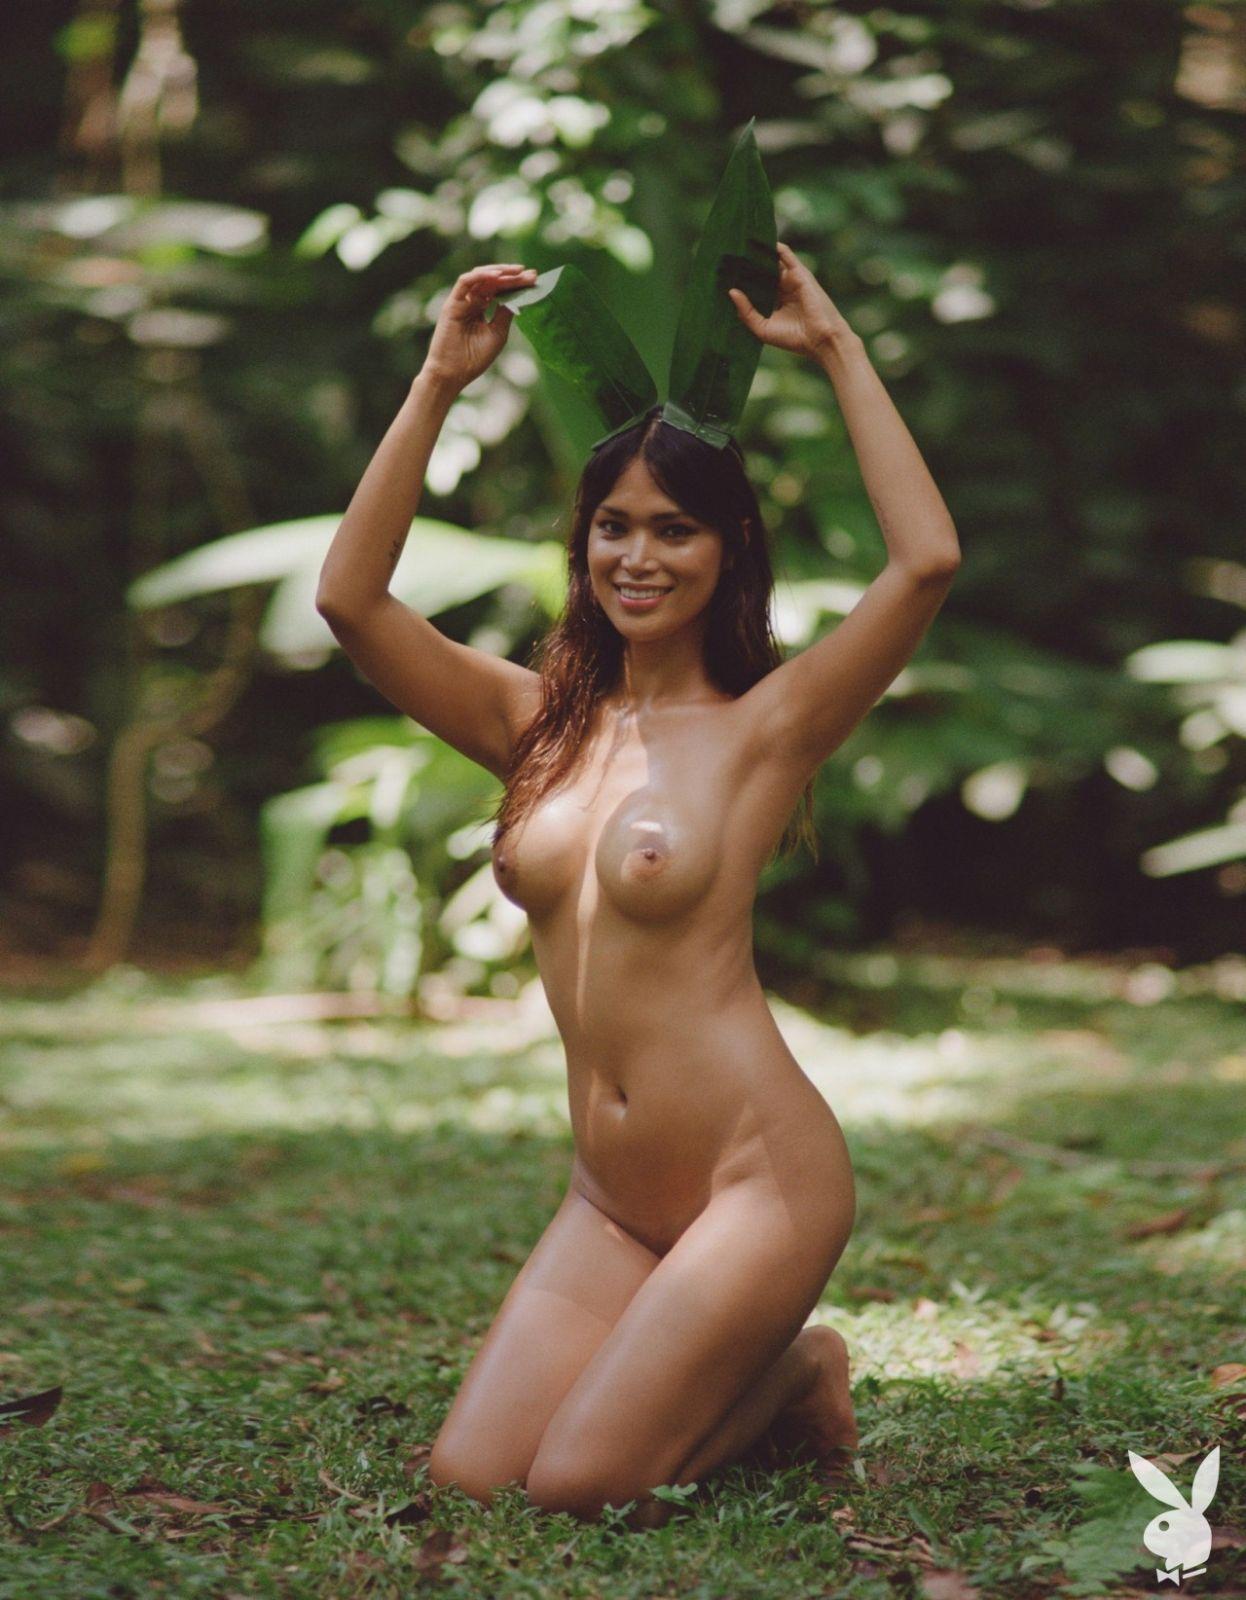 Geena Rocero Nude in Playmate August 2019 at Playmate Hunter